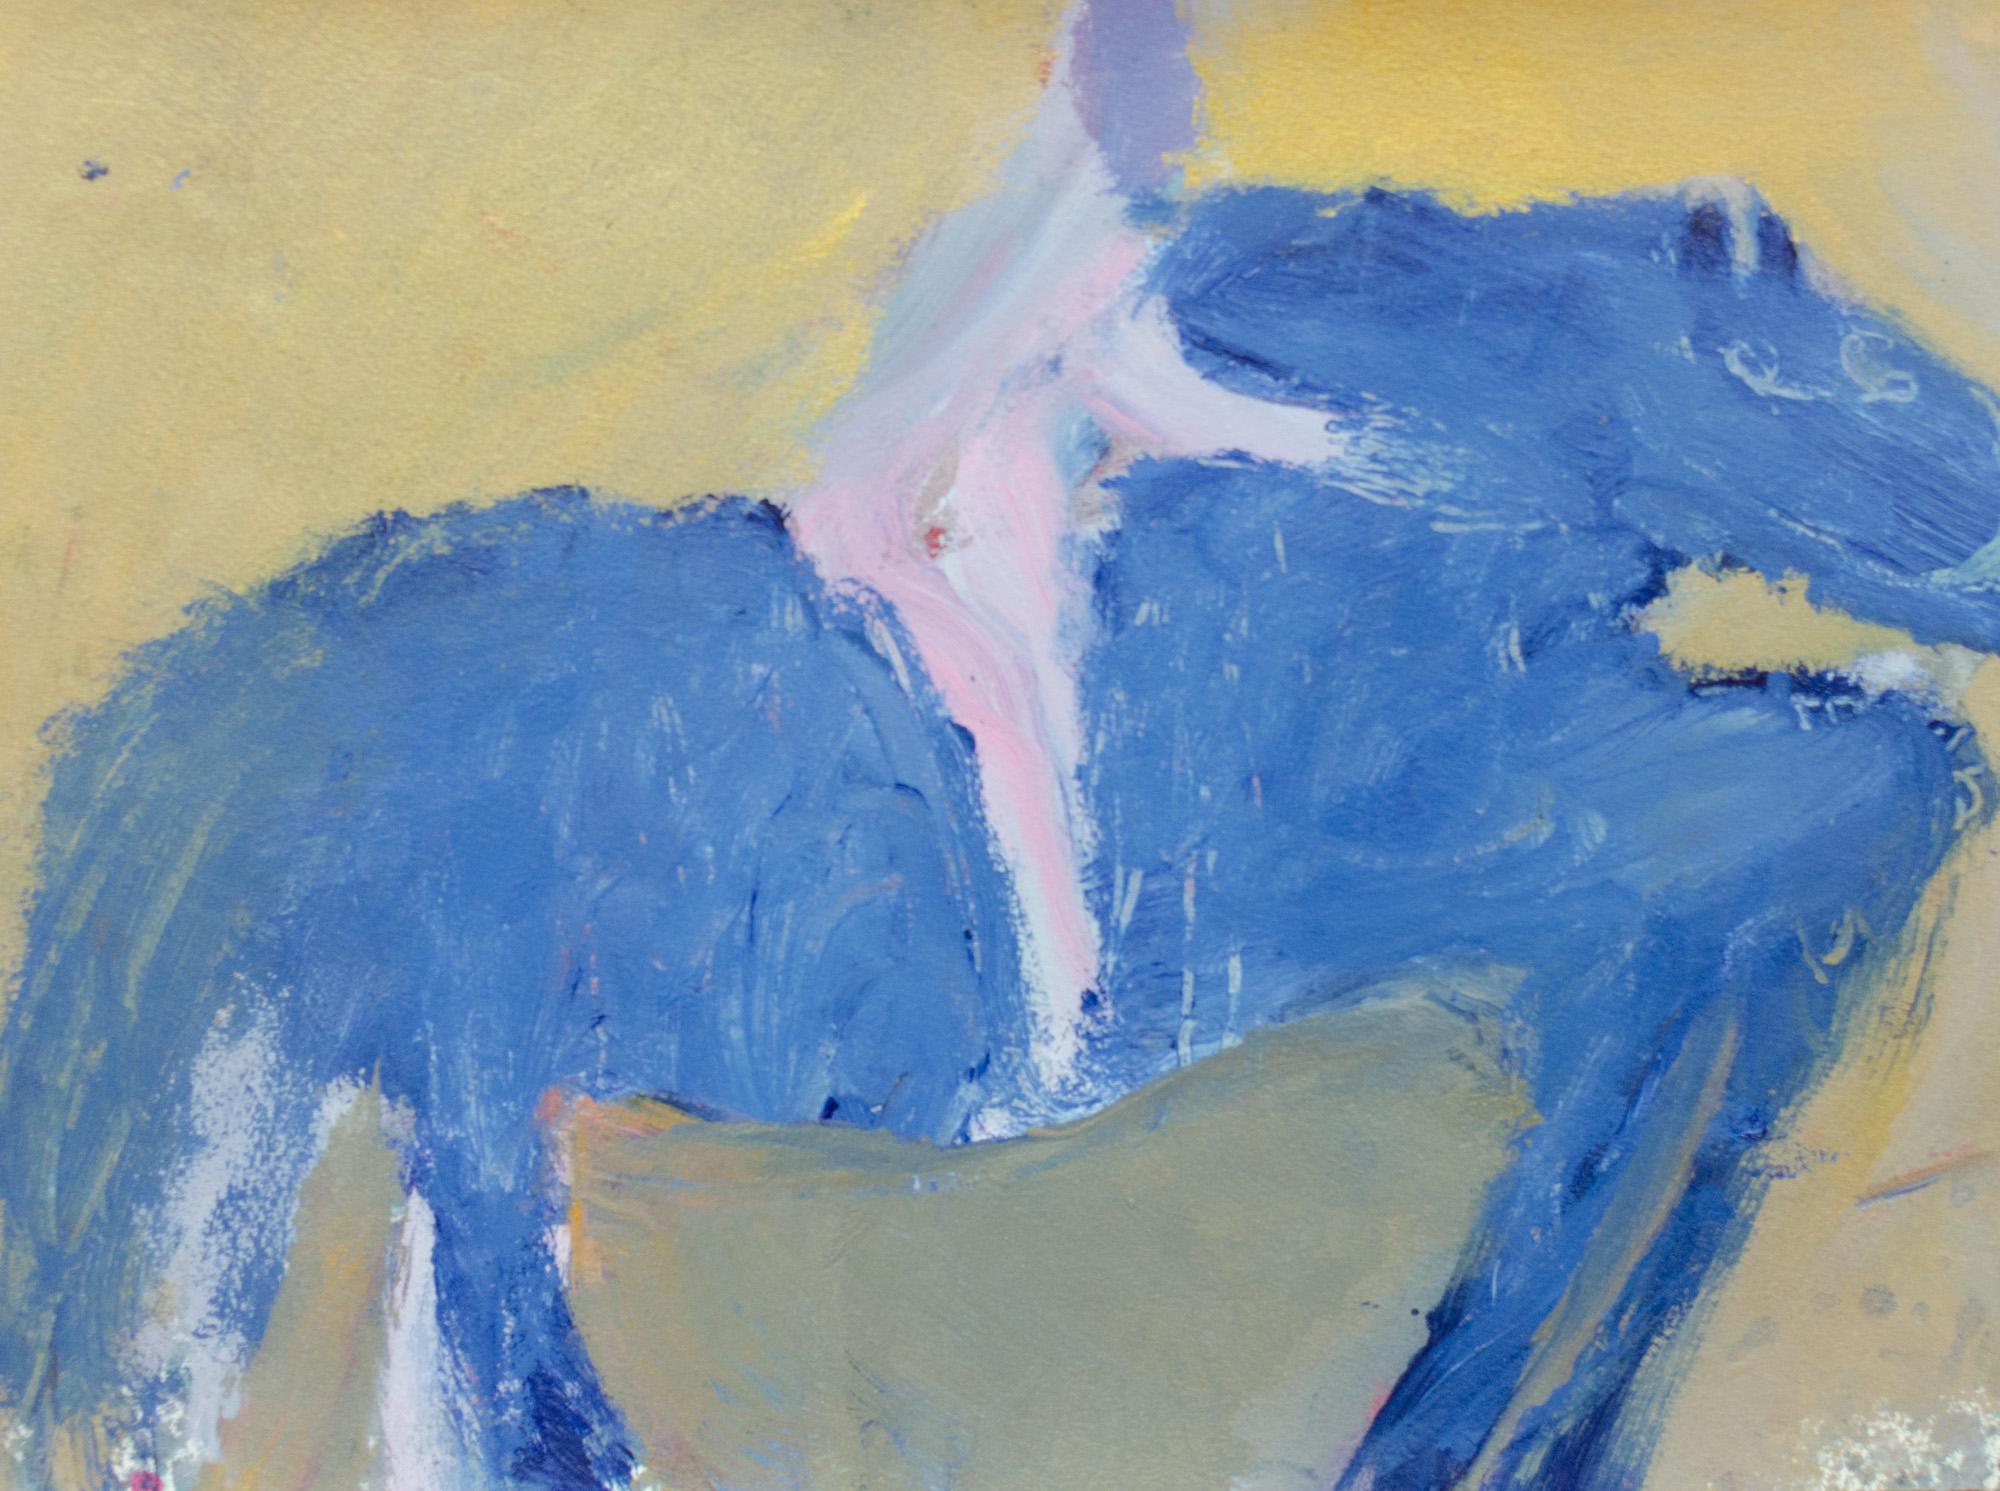 Rhys Lee, Riders, 2016, Acrylic on paper, 28 x 38cm, $700-31.jpg